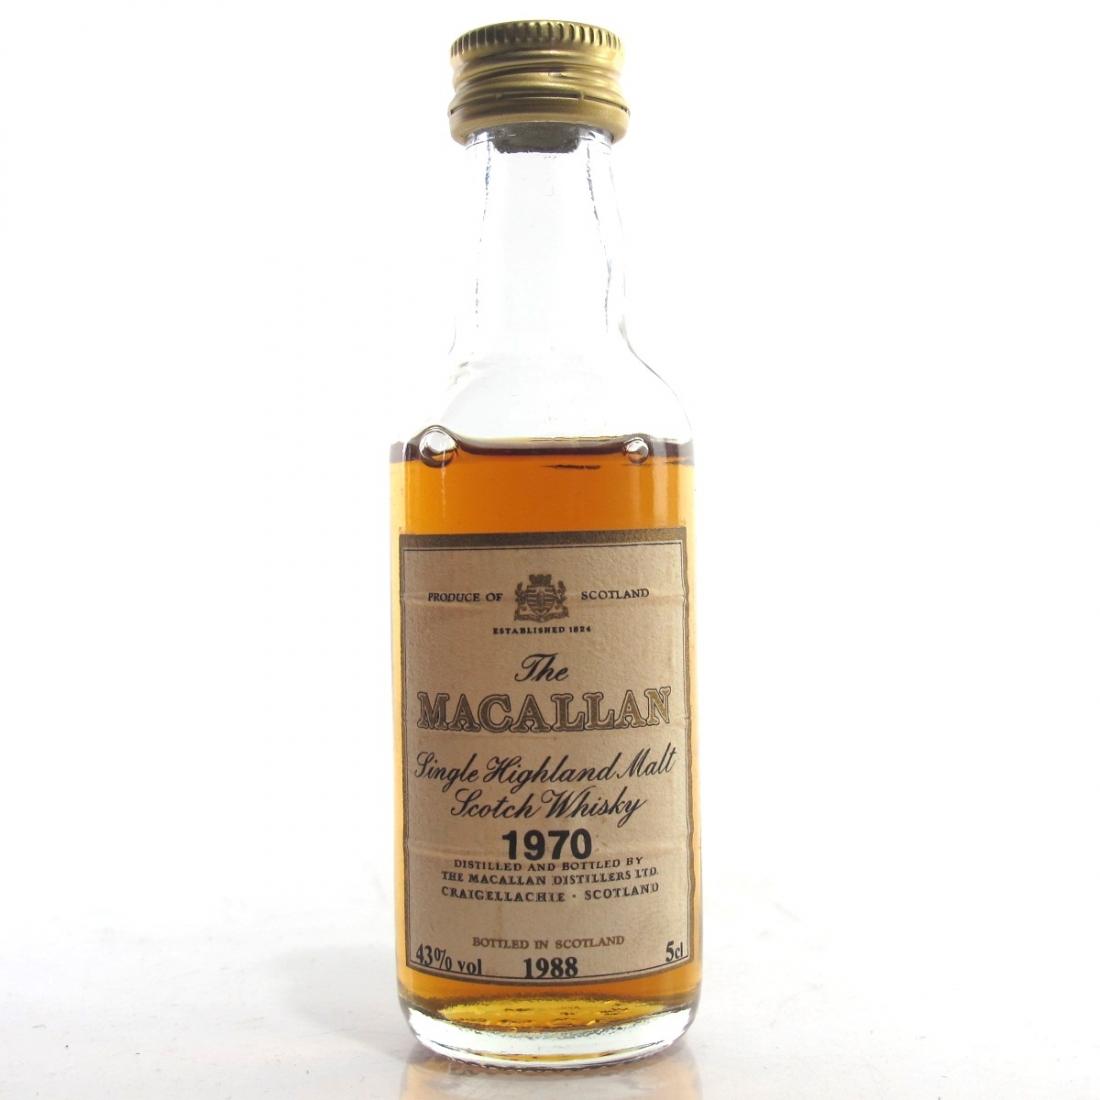 Macallan 1970 18 Year Old Miniature 5cl